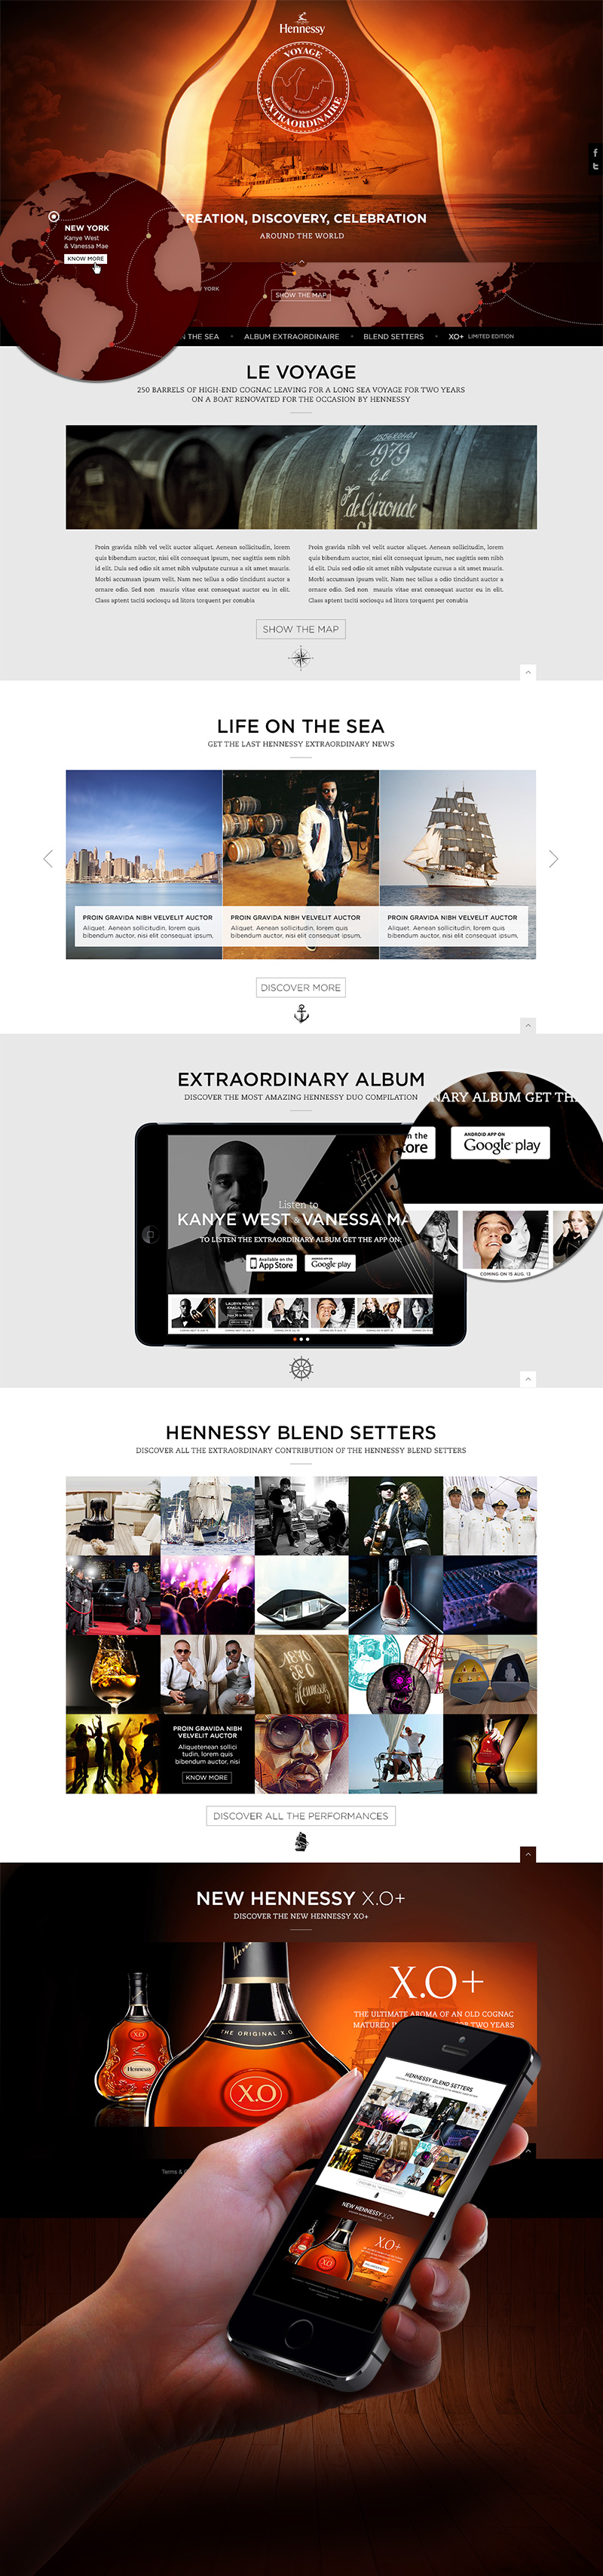 Directeur artistique freelance Portfolio Paris - HENNESSY site internet